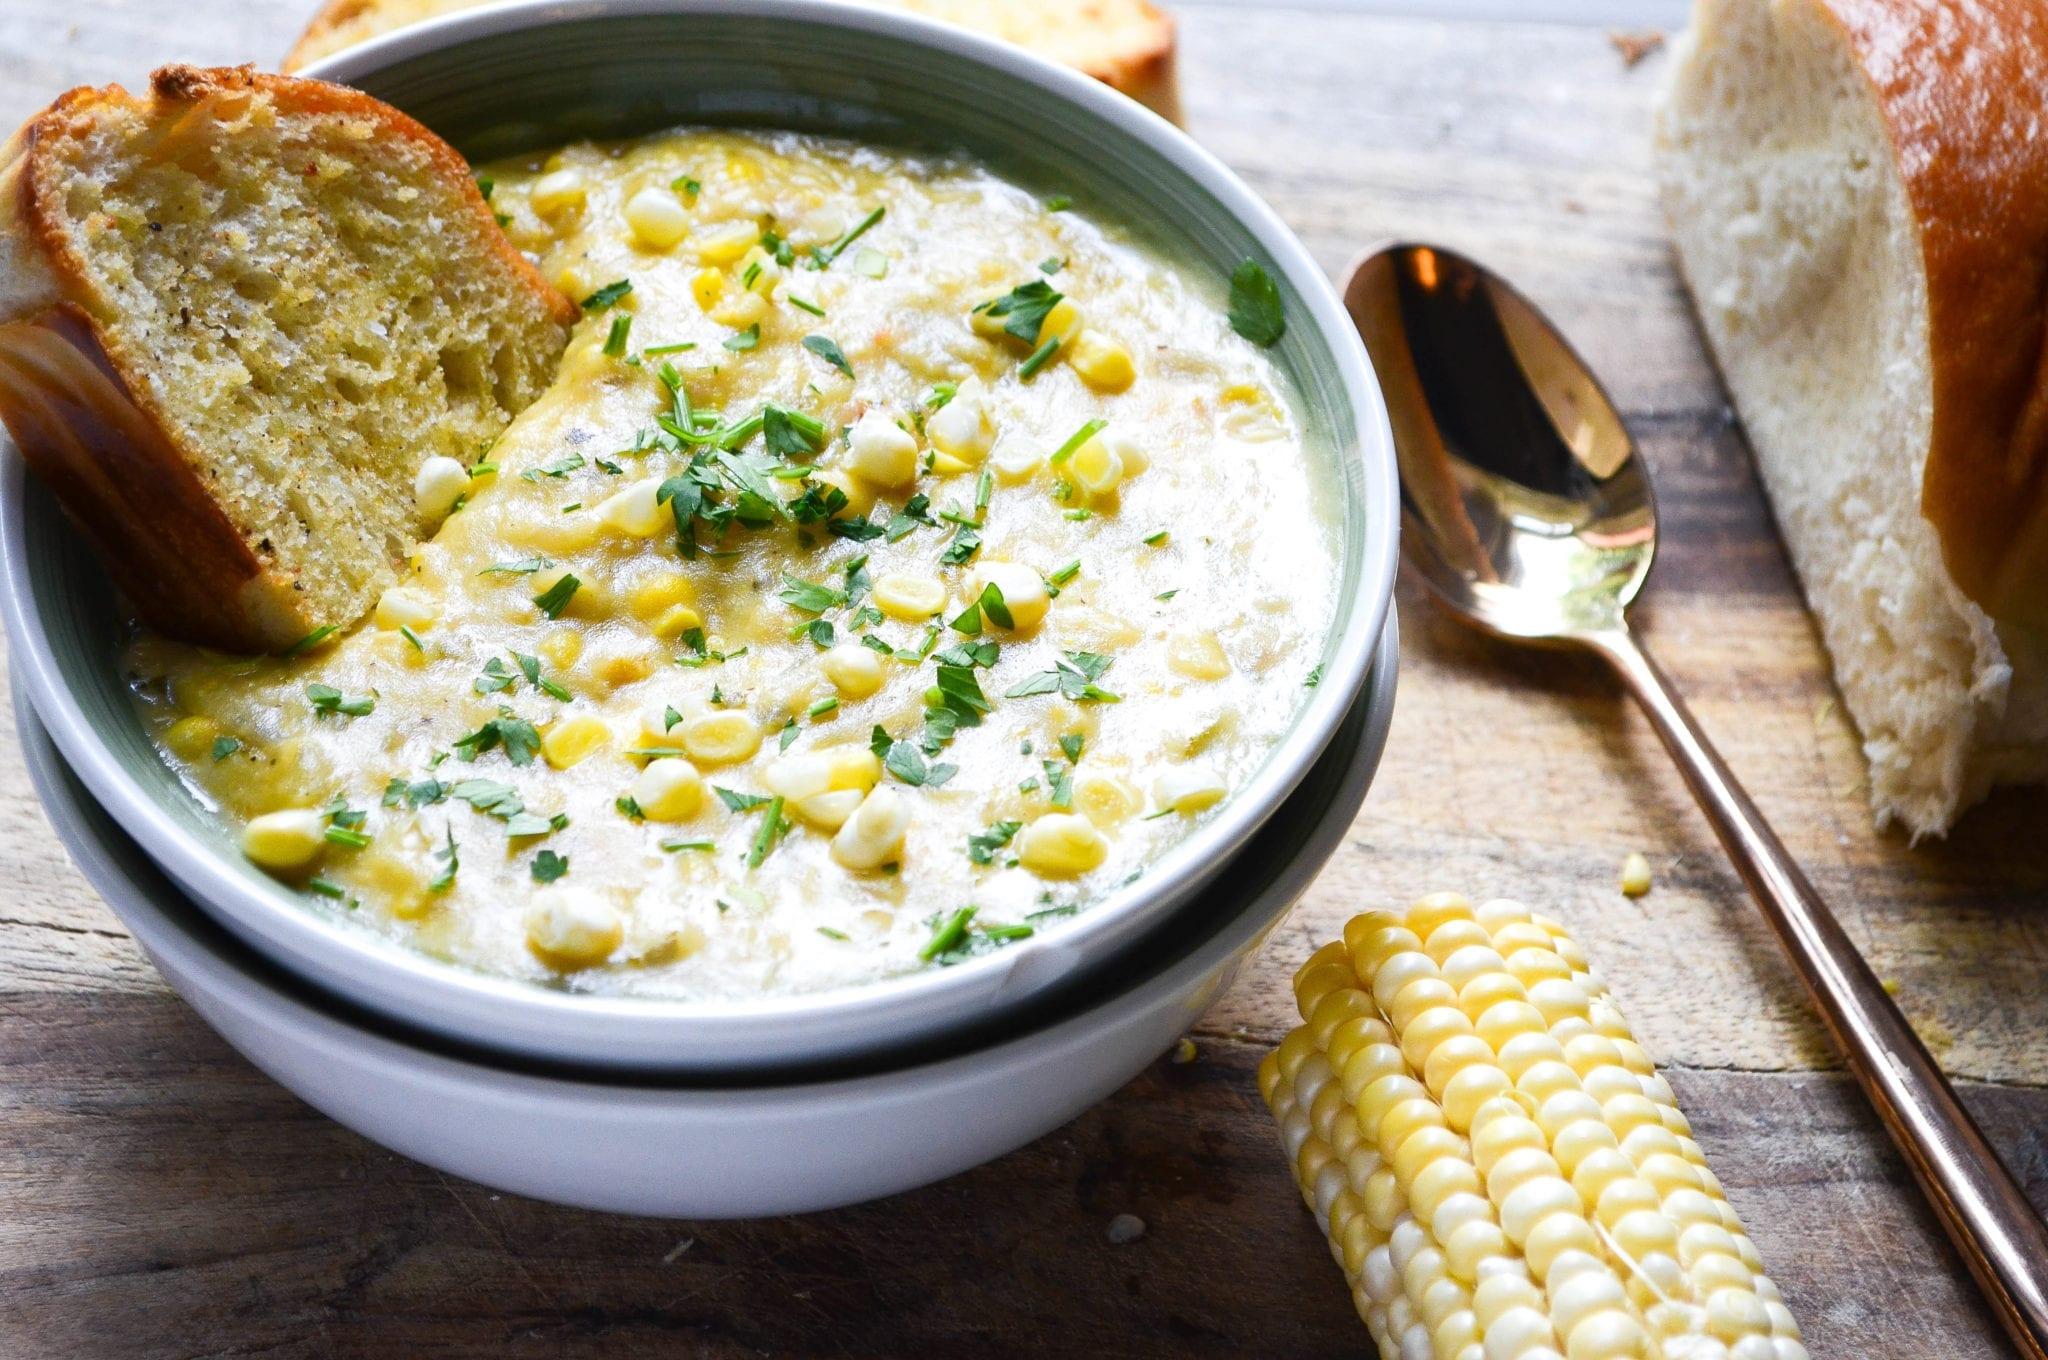 Creamy Corn Chowder With Goat Cheese